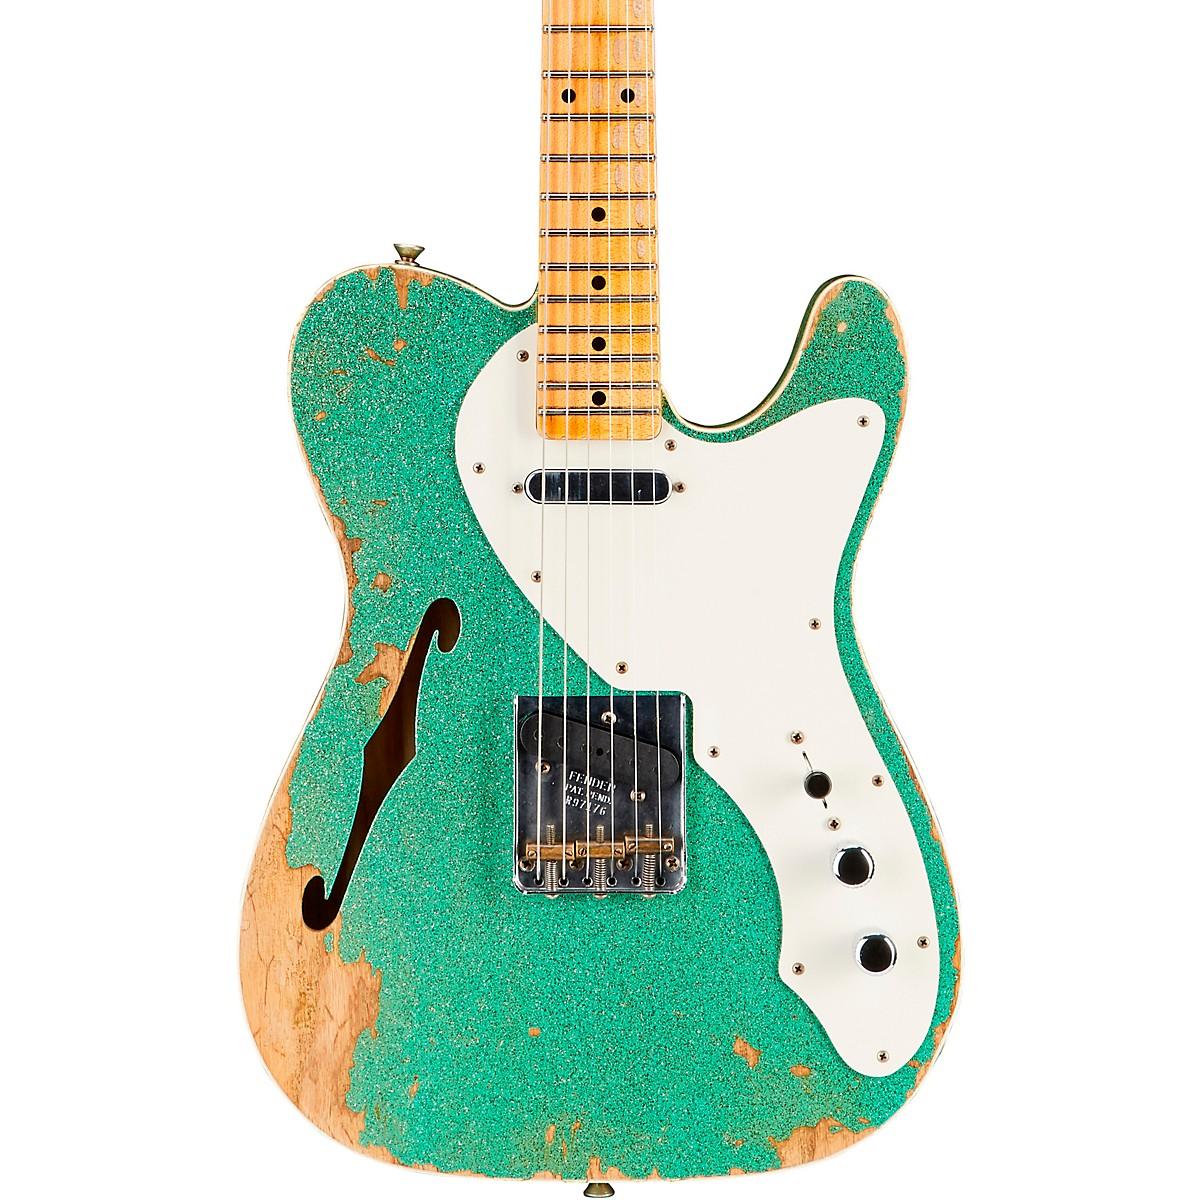 Fender Custom Shop 50s Custom Thinline Telecaster Electric Guitar